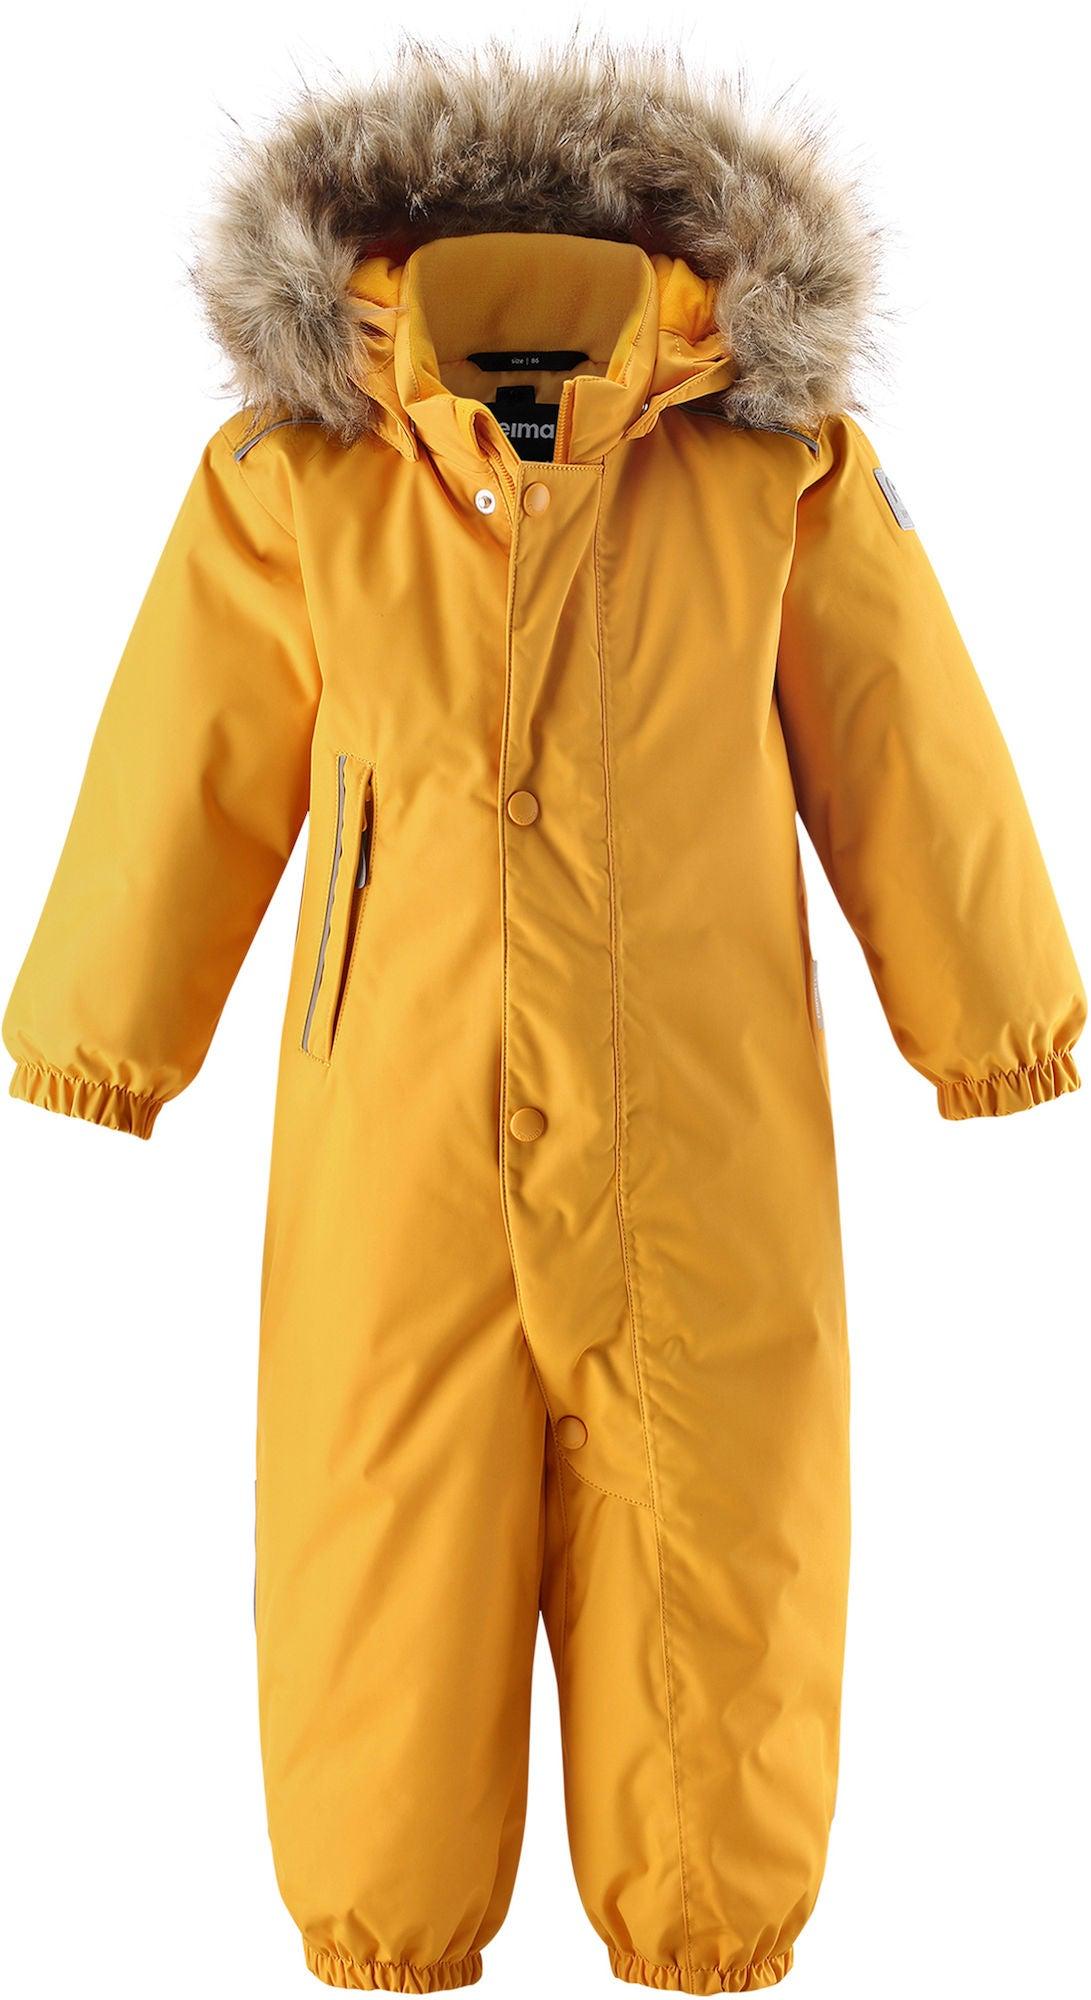 Reimatec Gotland Overall, Warm Yellow, 80